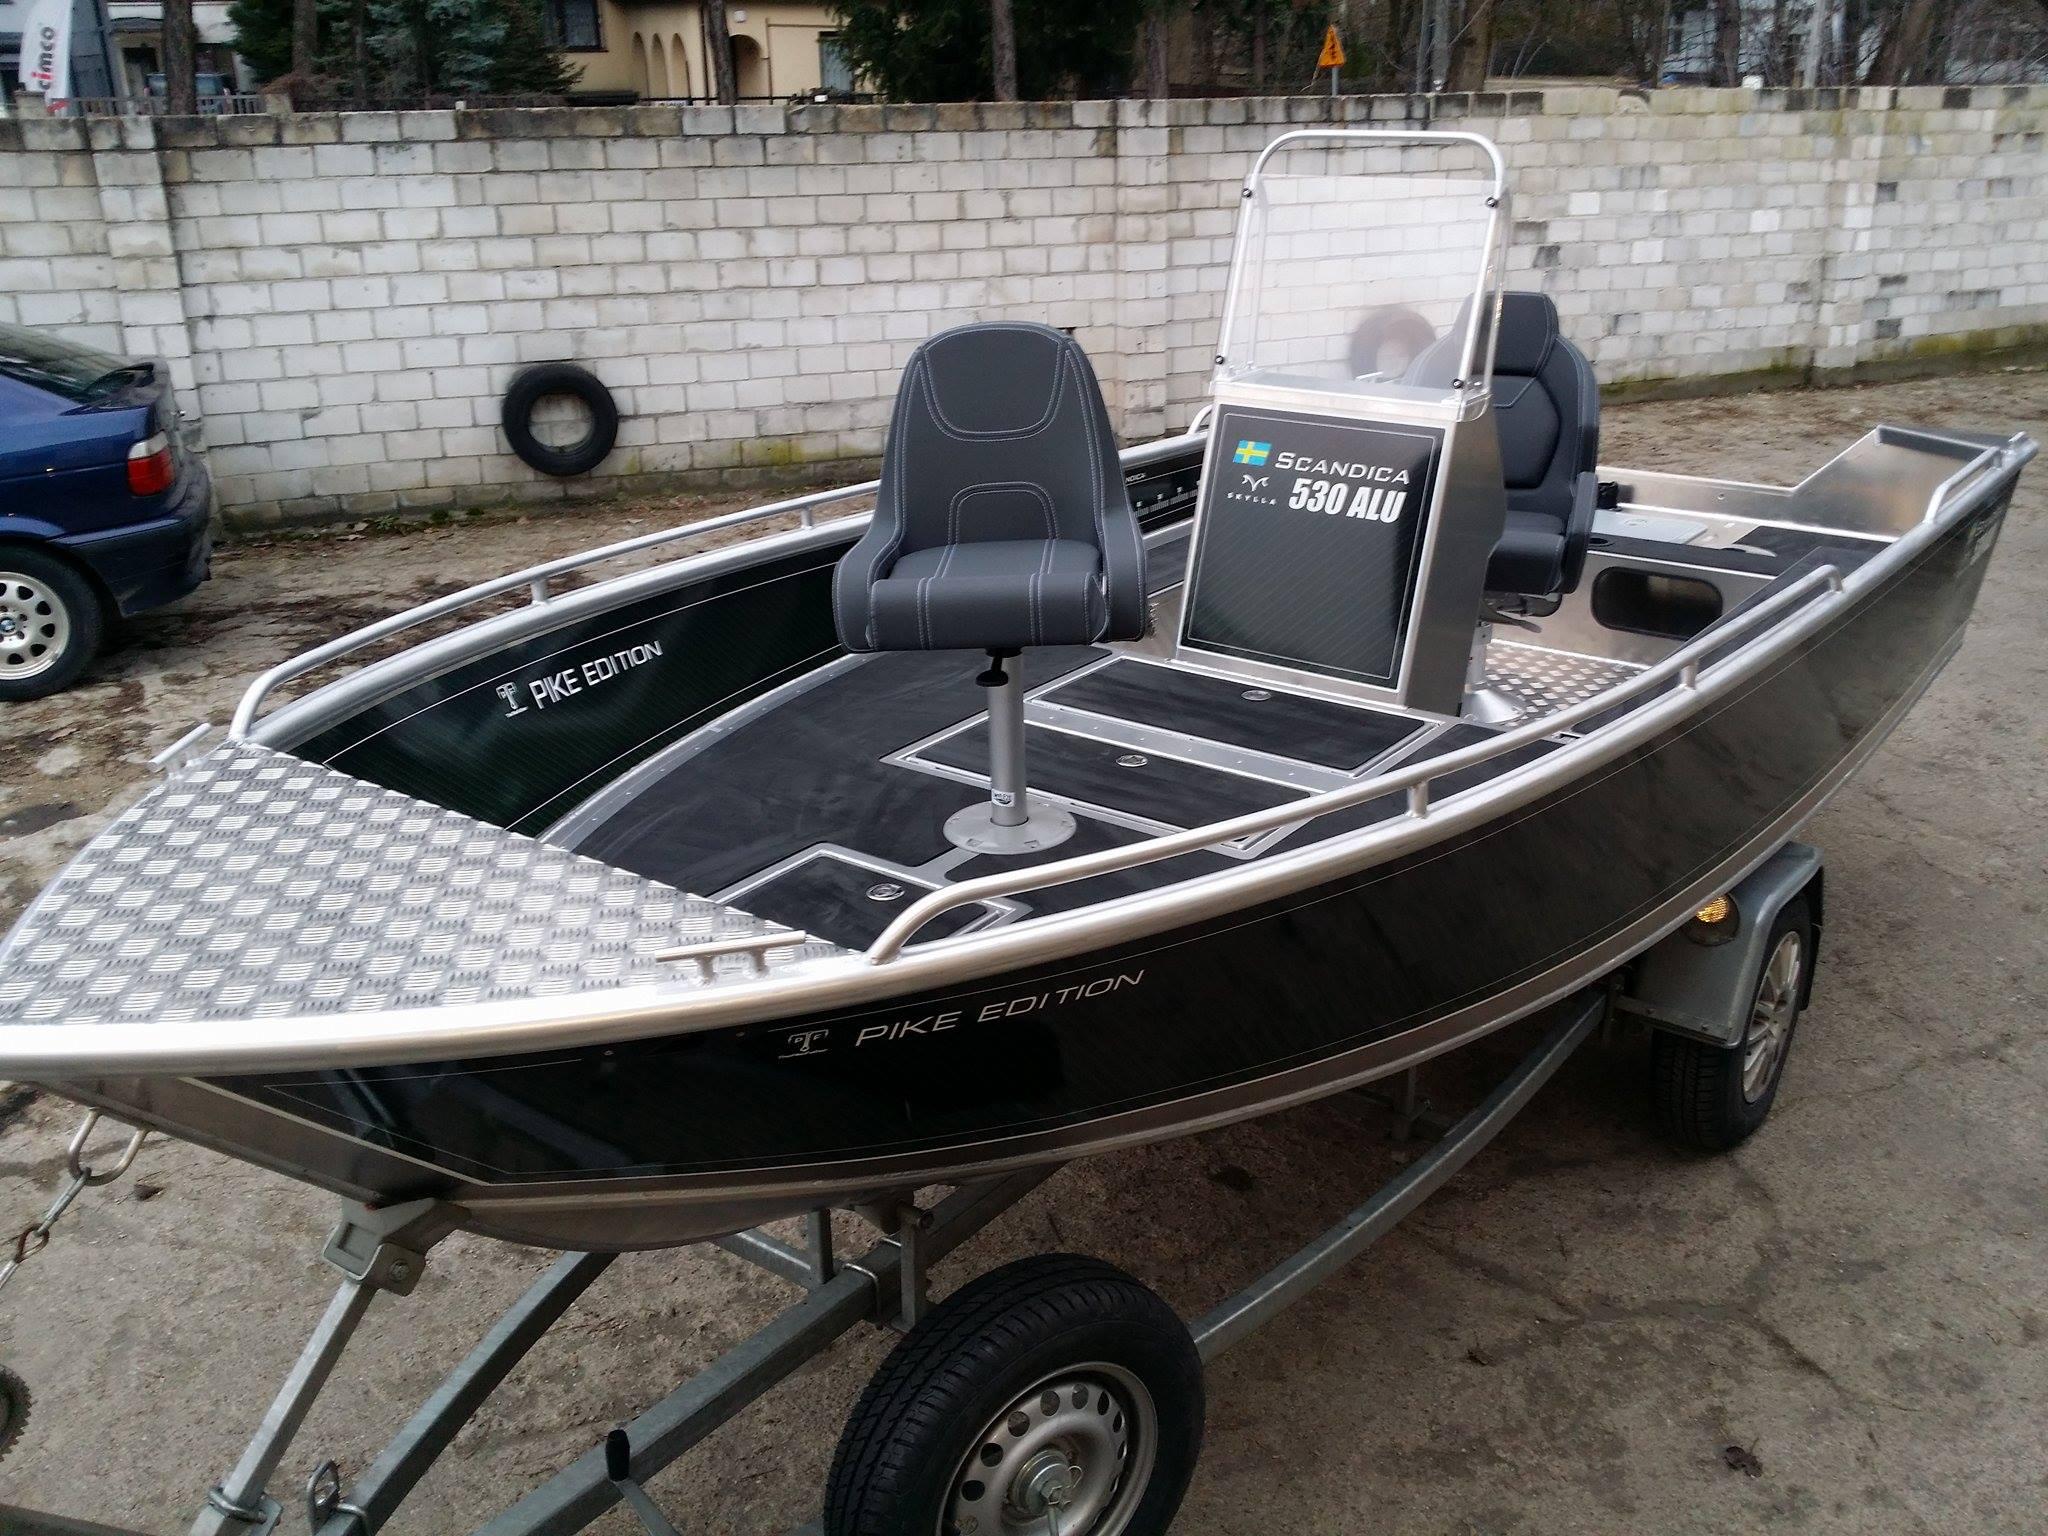 Scandica_530_ALU_styrpulpet_bat_Ullared_Boat_Sweden_1